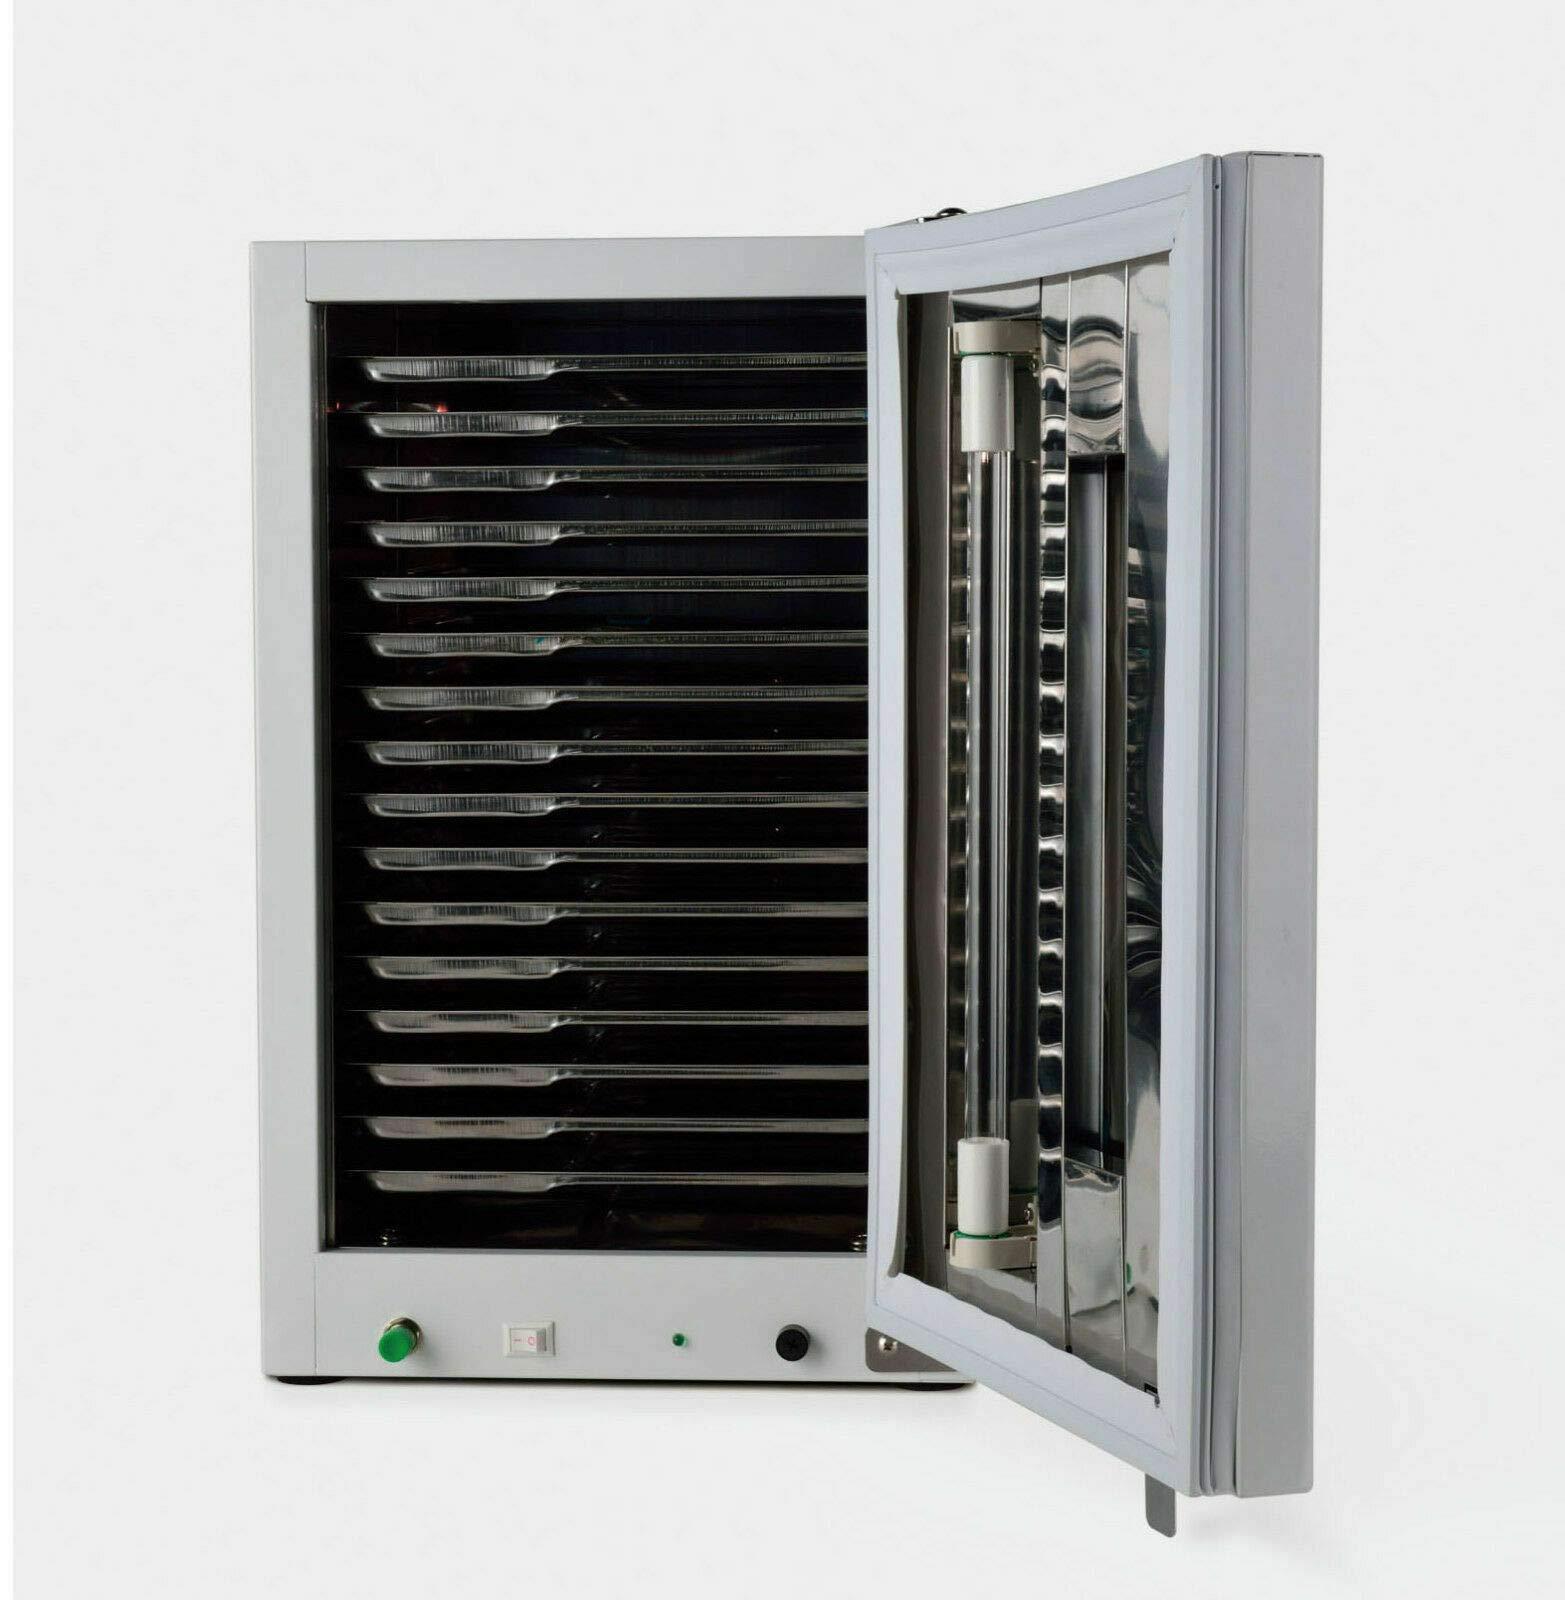 APHRODITE 27L Me-dical UV Disinfection Cabinet Strilizer Tool Sterilization Instrument by Aphrodite